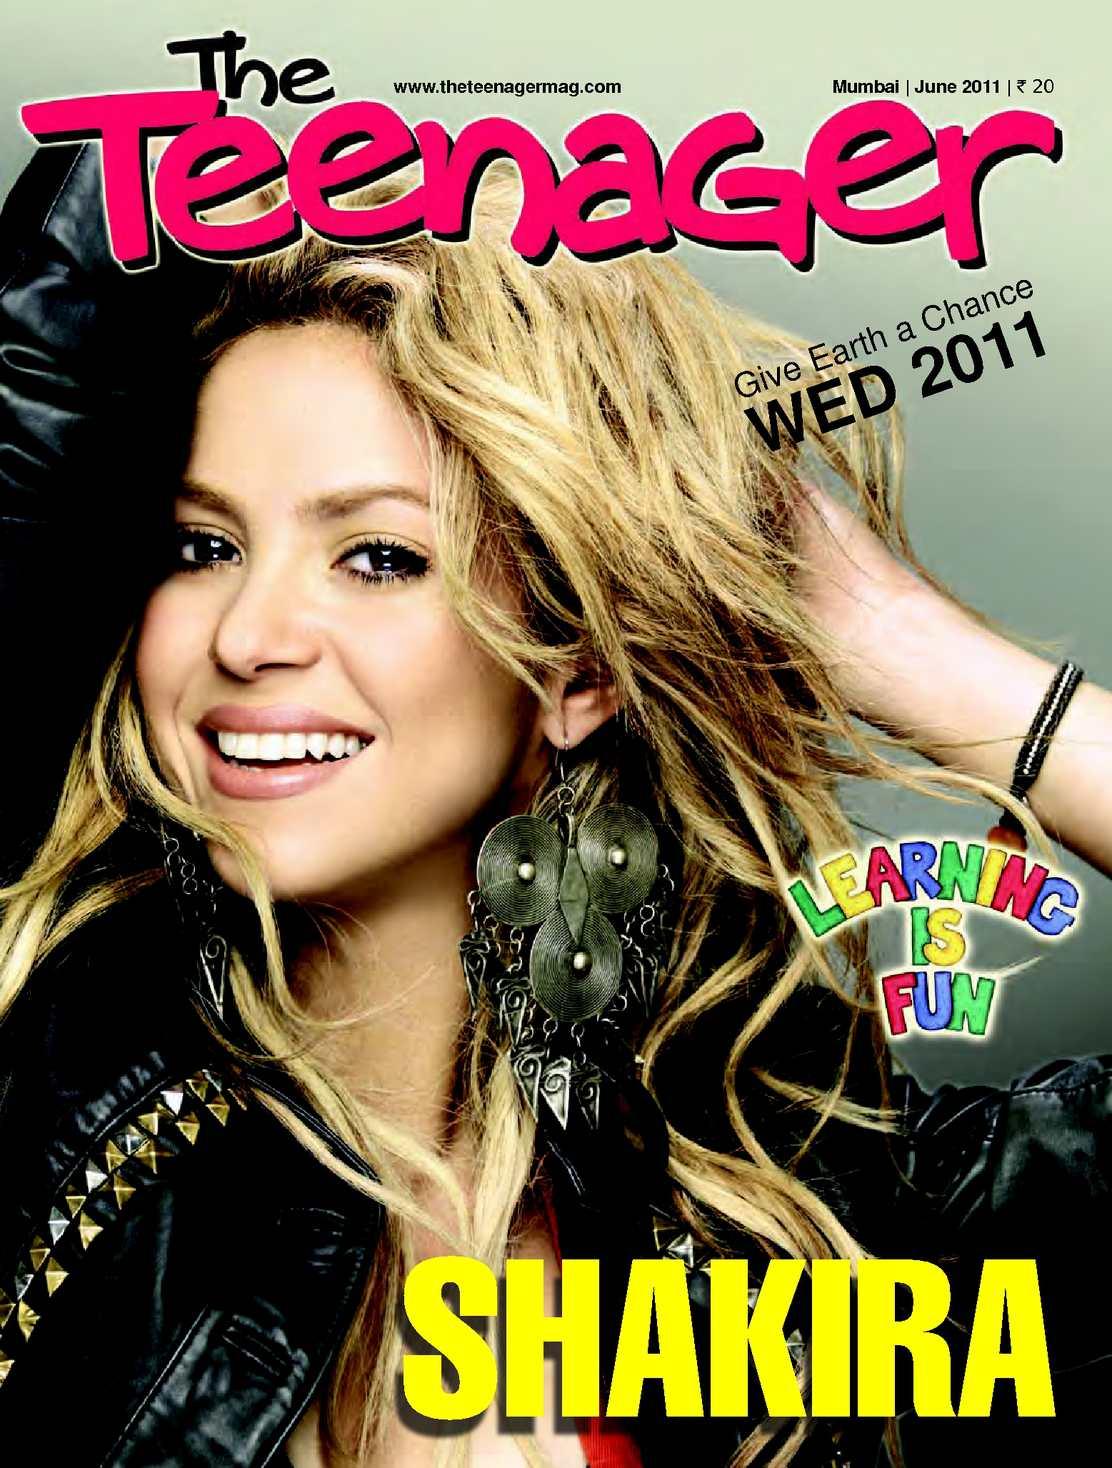 calam233o the teenager today i june 2011 i shakira